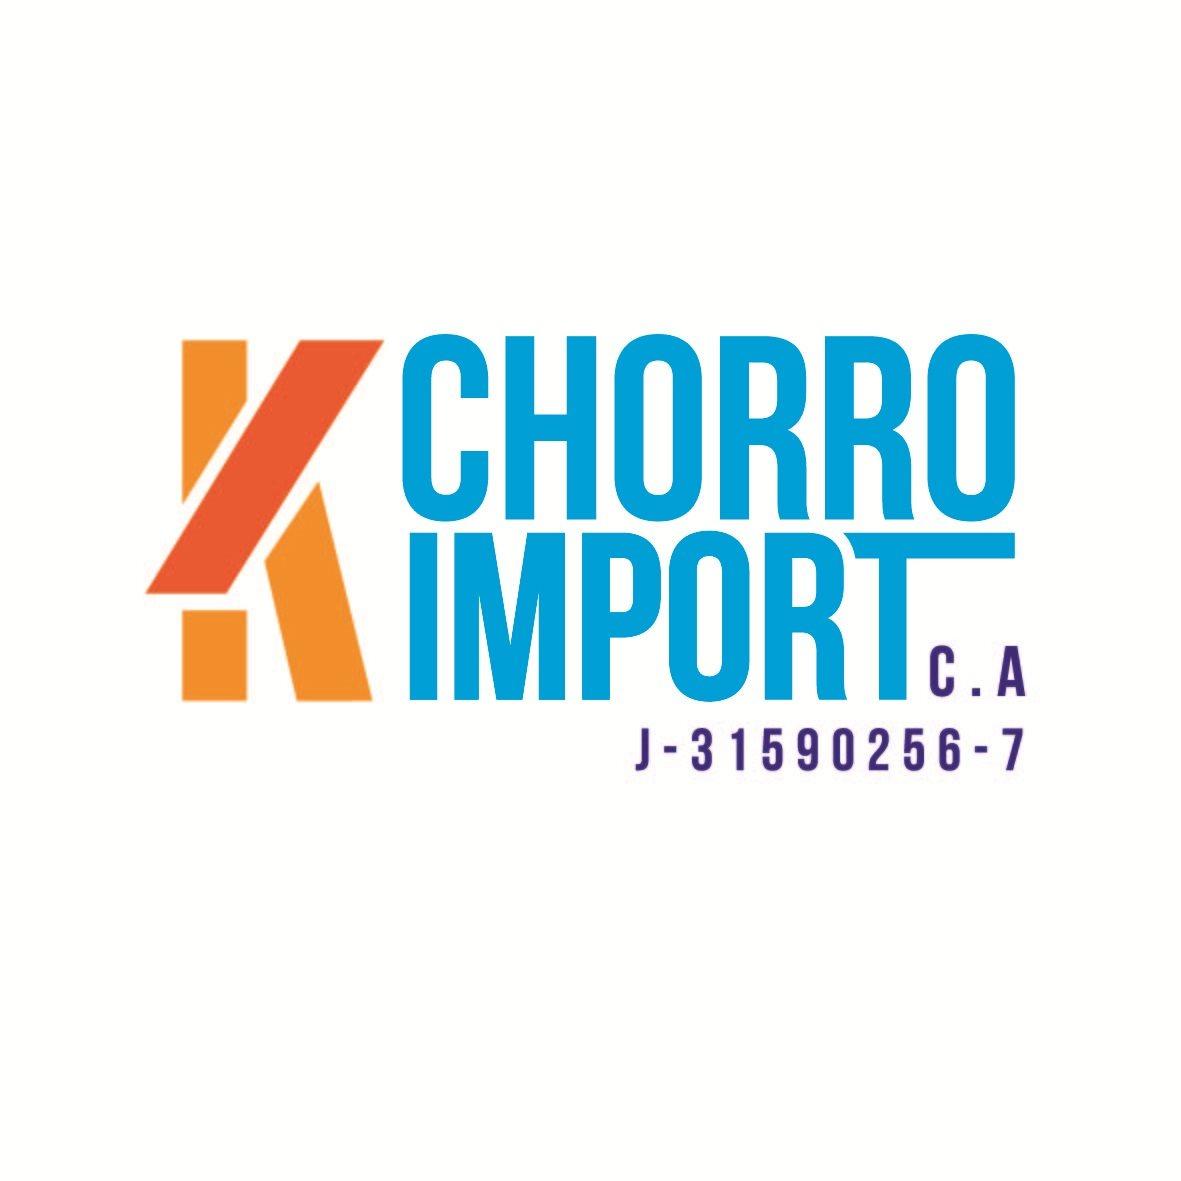 K-CHORRO IMPORT,C.A